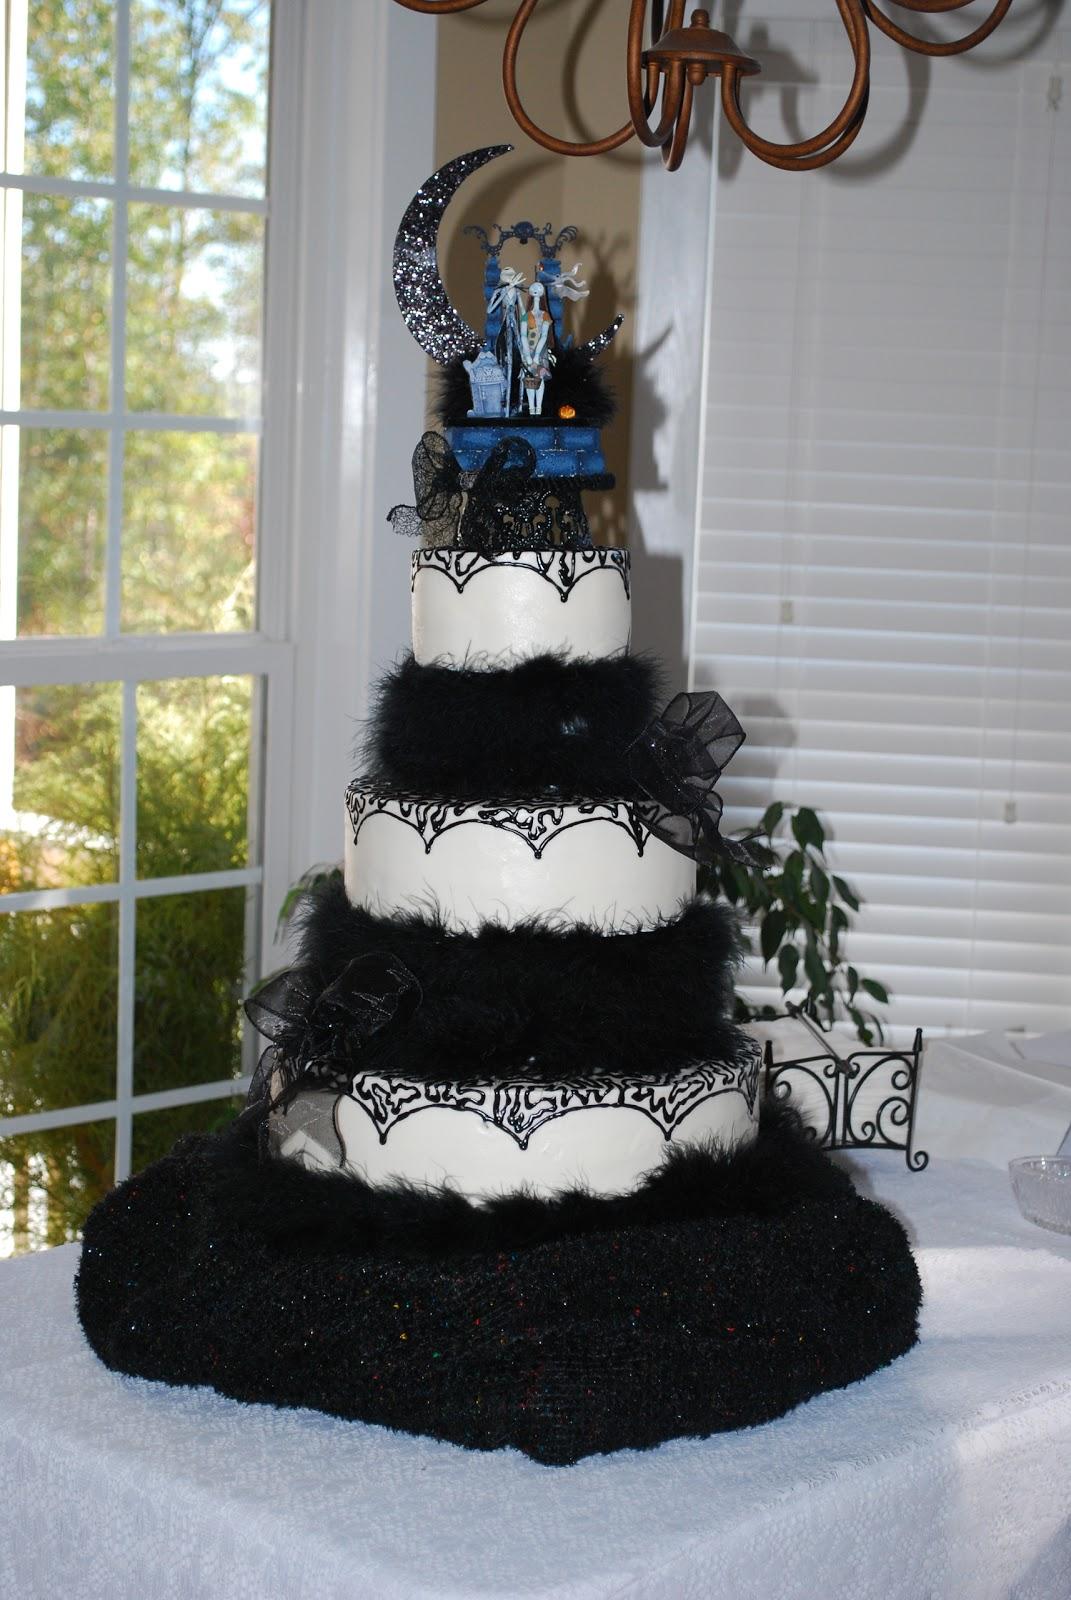 Birthday Cake Center: Nightmare Before Christmas